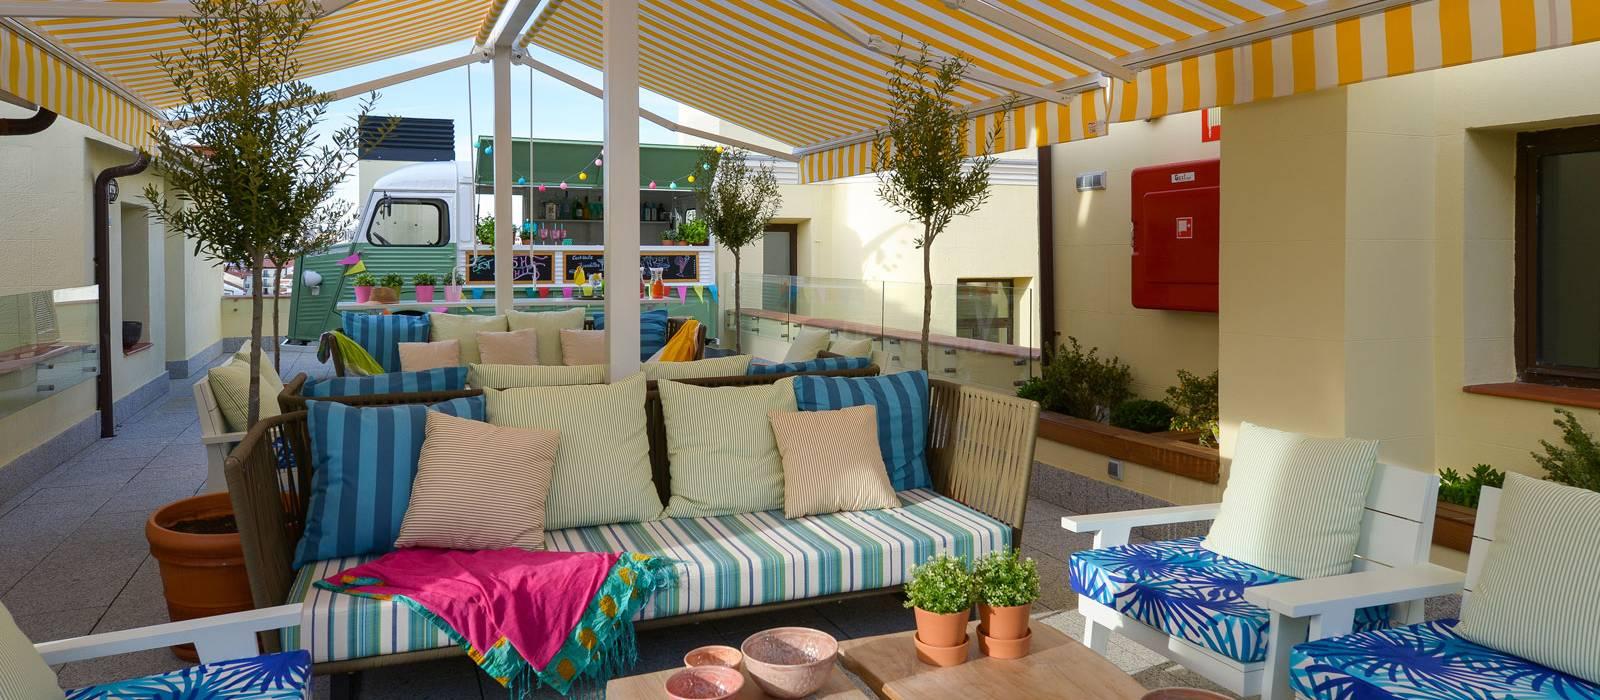 Rooftop terrace hotel vincci the mint 4 - Hoteles vincci barcelona ...